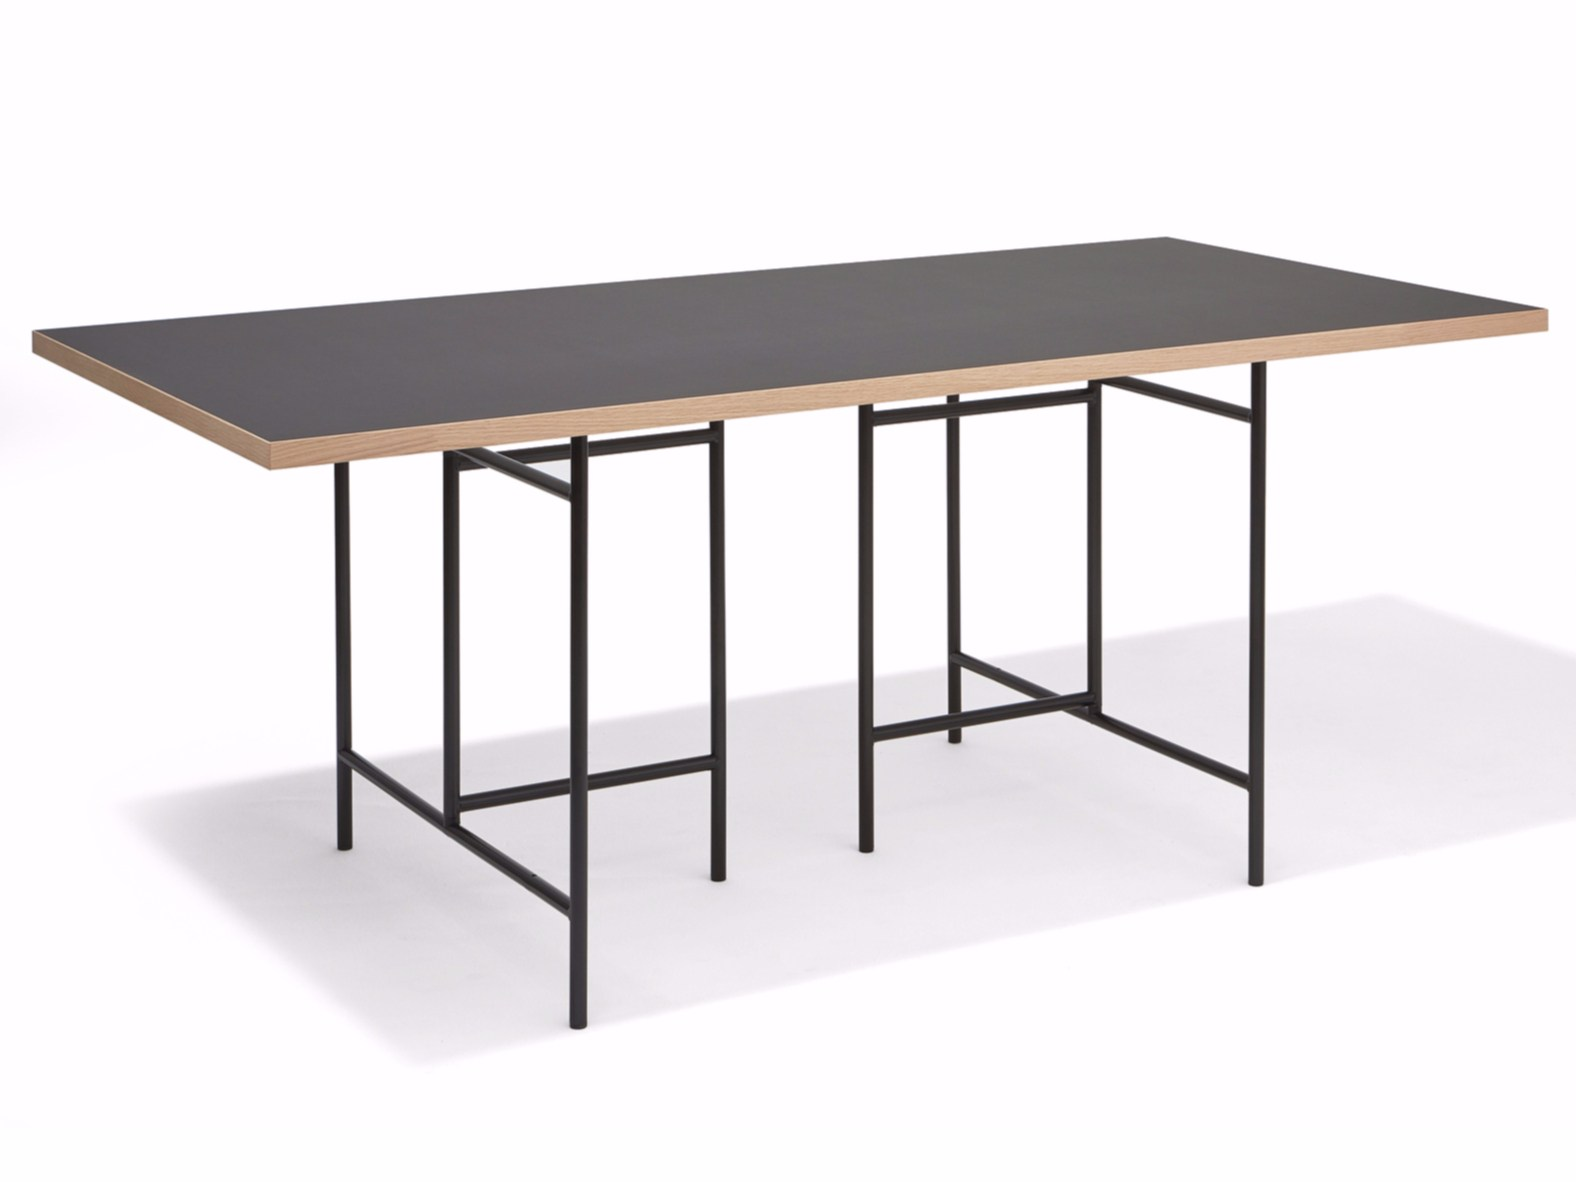 eiermann 3 rectangular table by richard lampert design alexander seifried. Black Bedroom Furniture Sets. Home Design Ideas